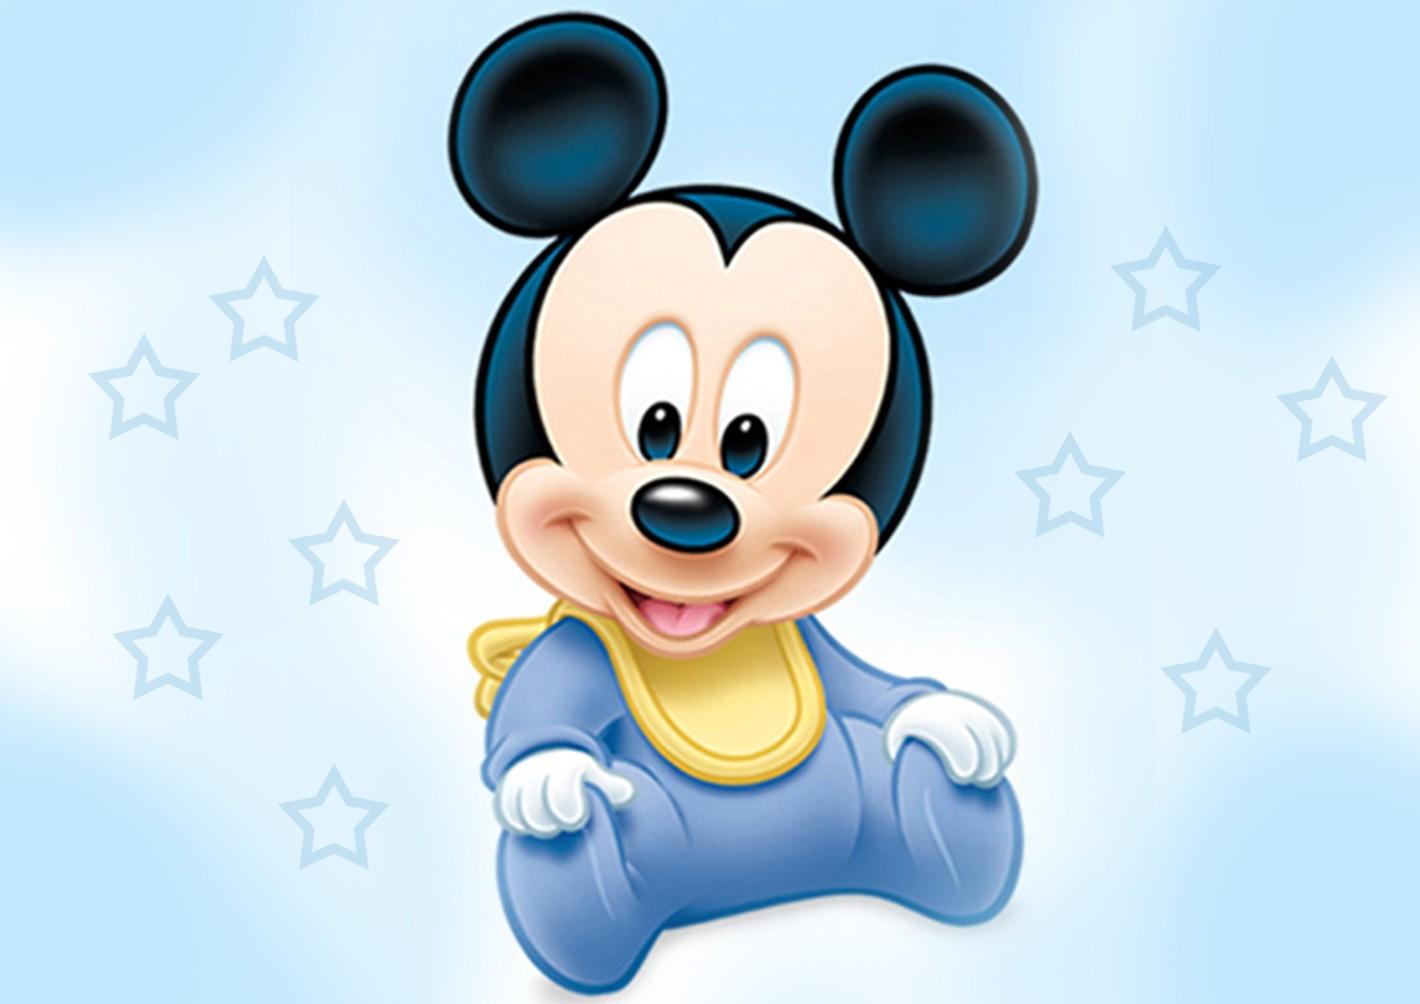 Baby Mickey Mouse Wallpaper - WallpaperSafari